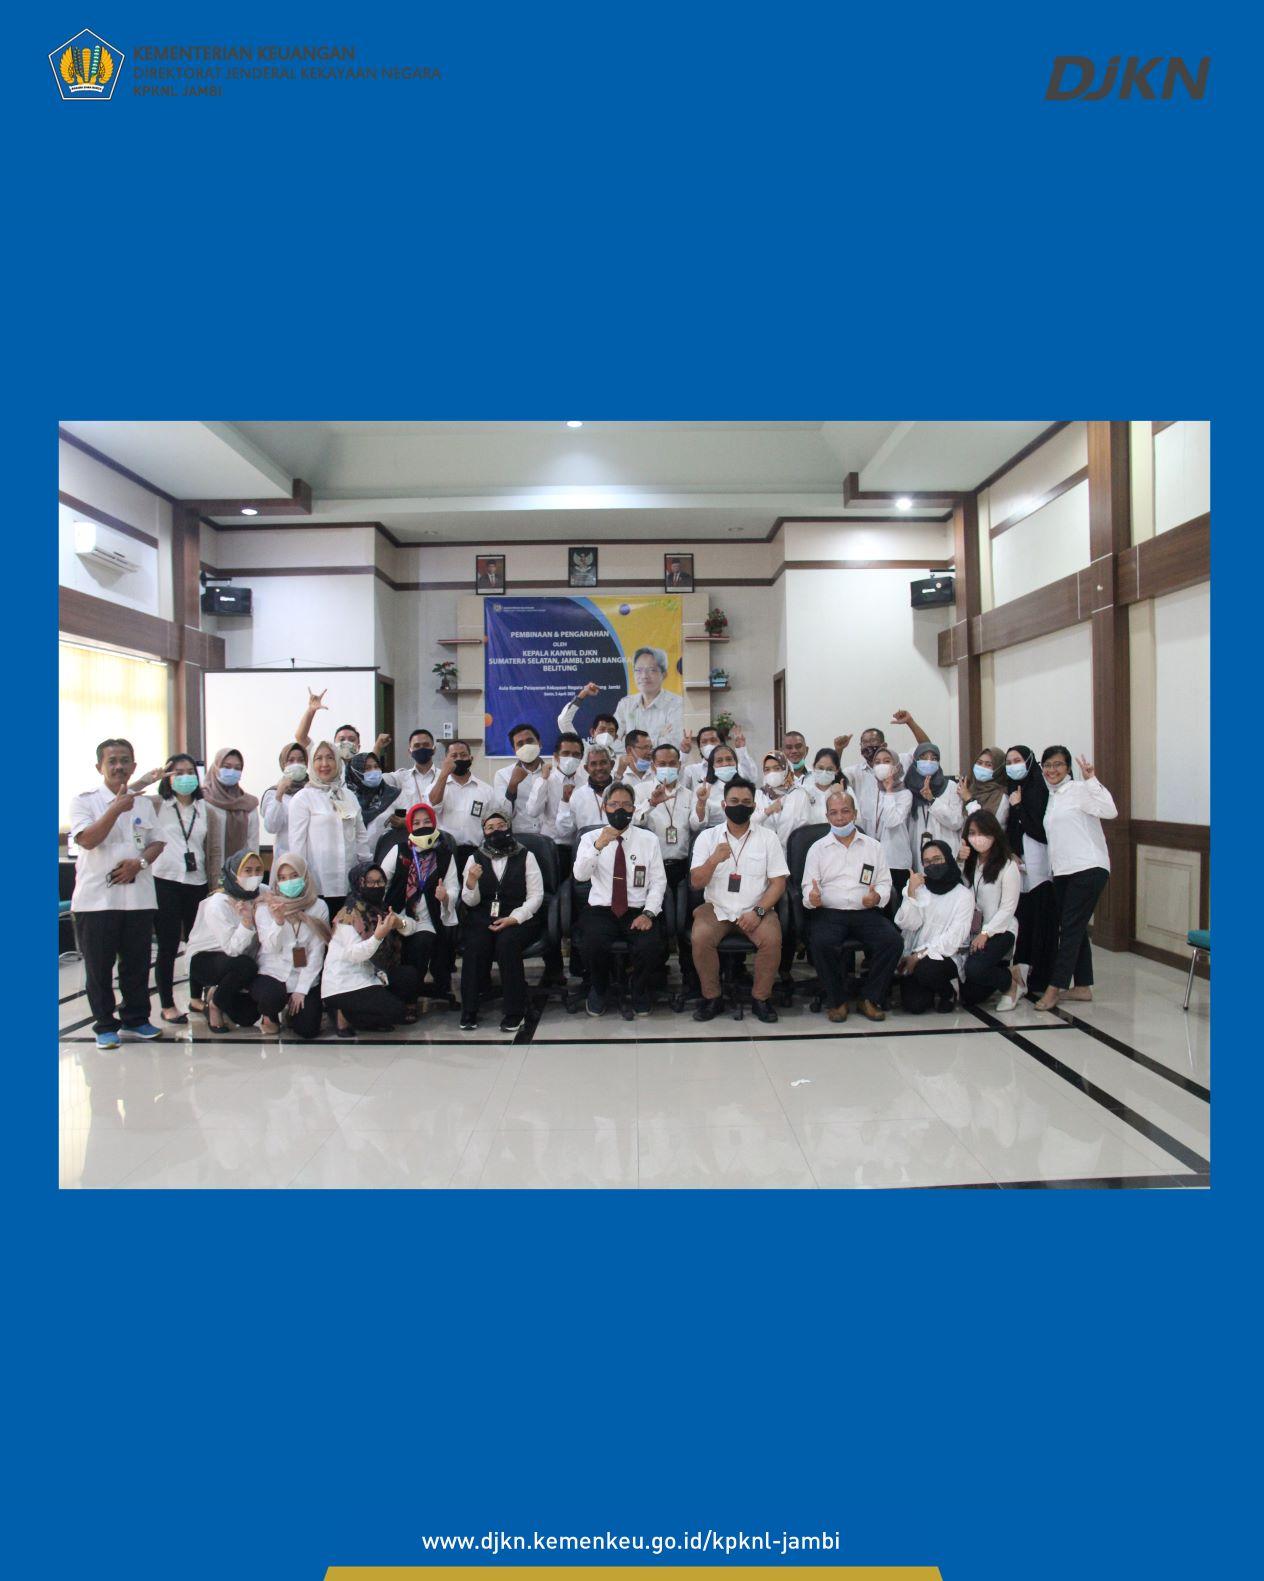 Kunjungan Kepala Kanwil DJKN Sumatera Selatan, Jambi dan Bangka Belitung